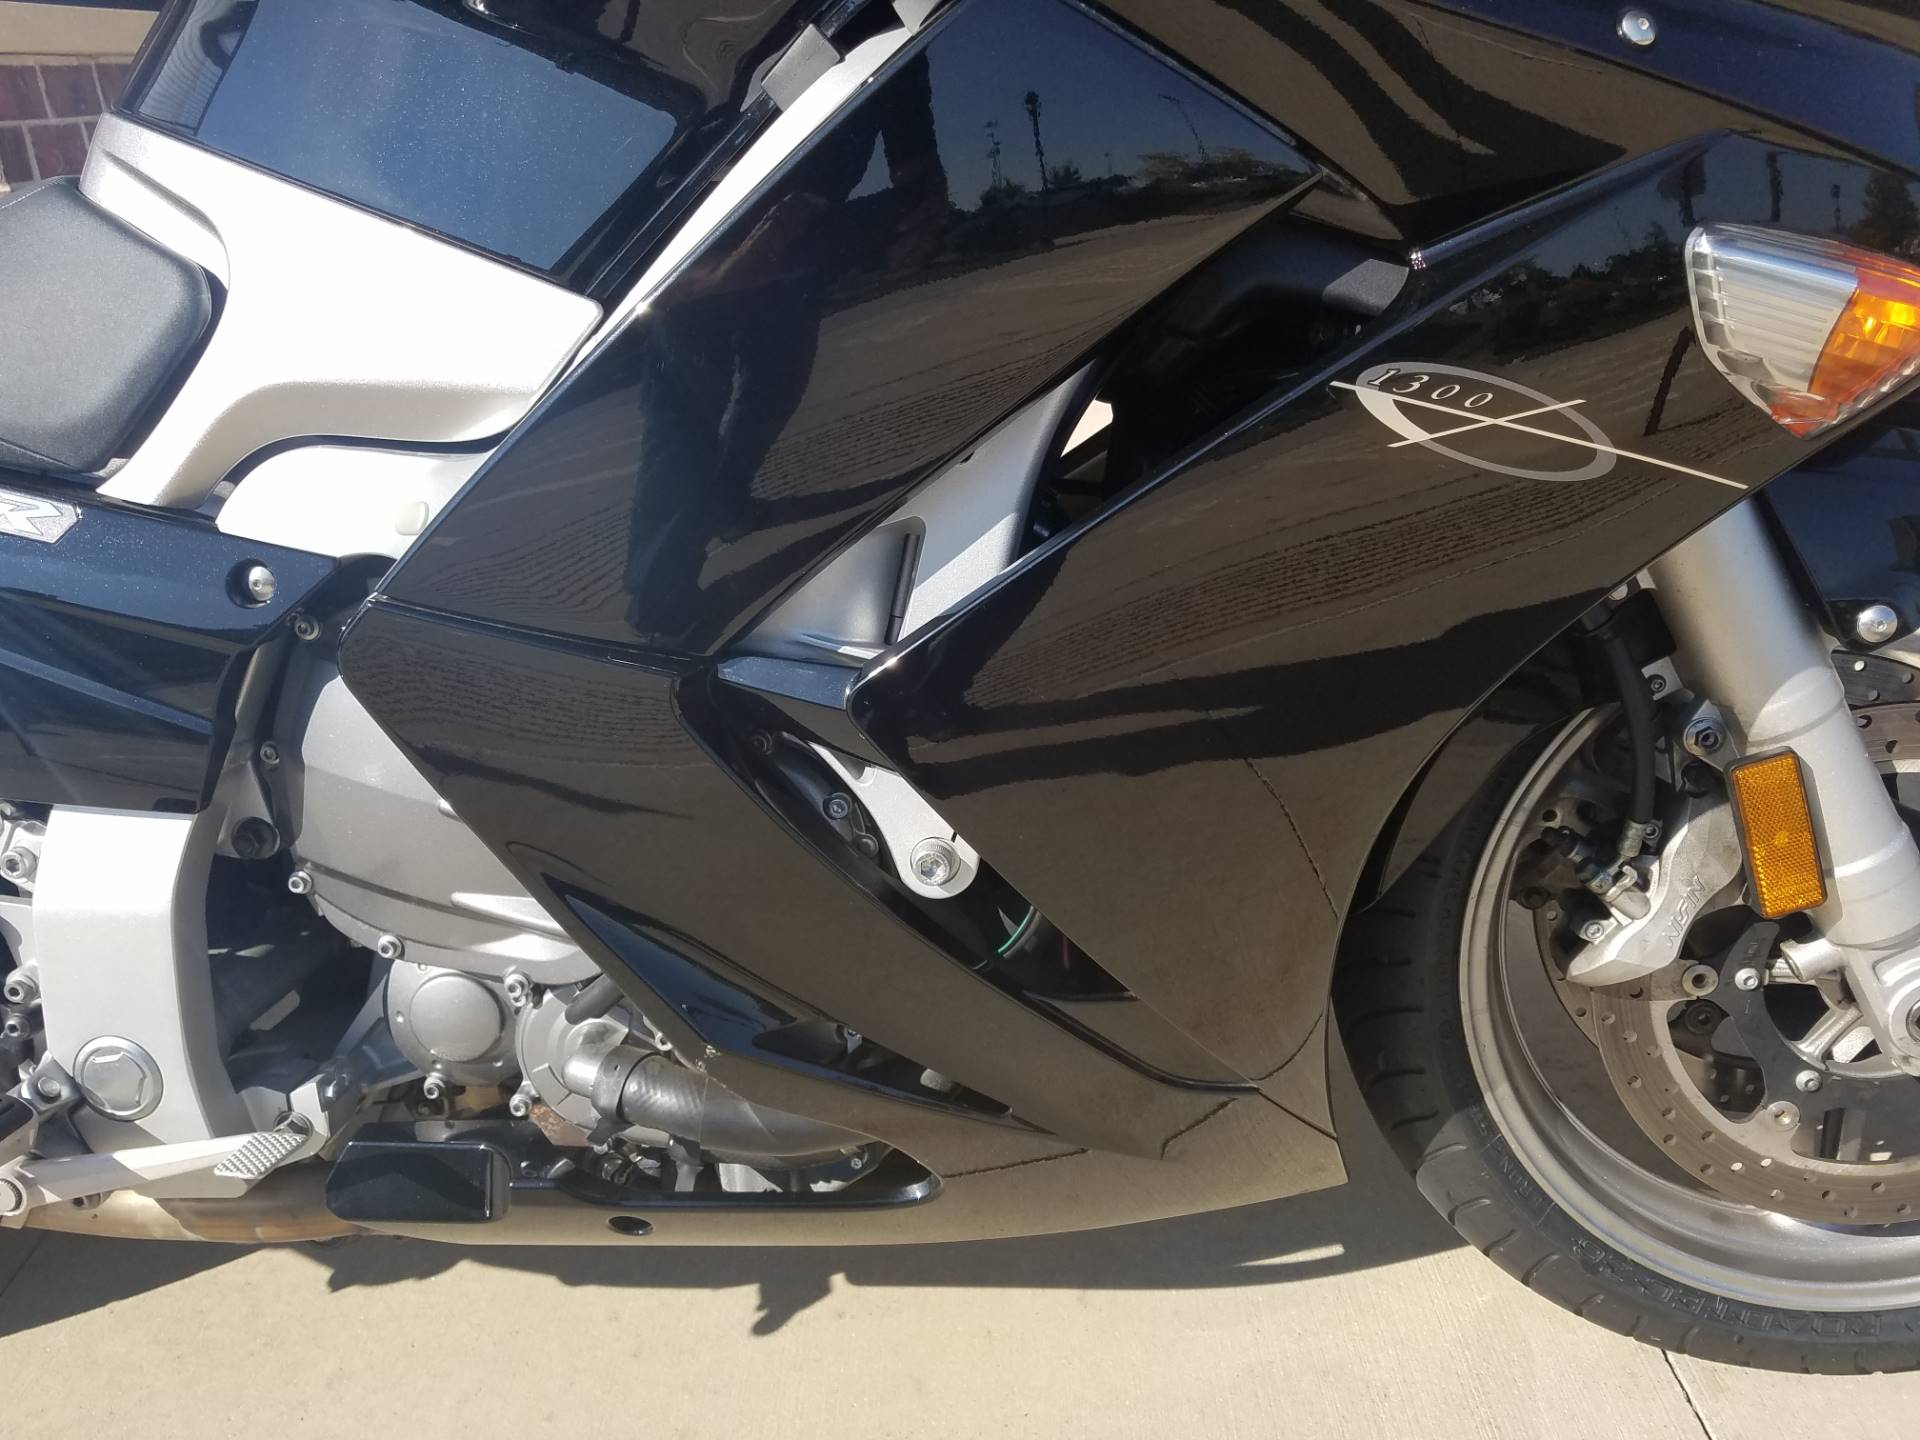 2008 Yamaha FJR1300A 7